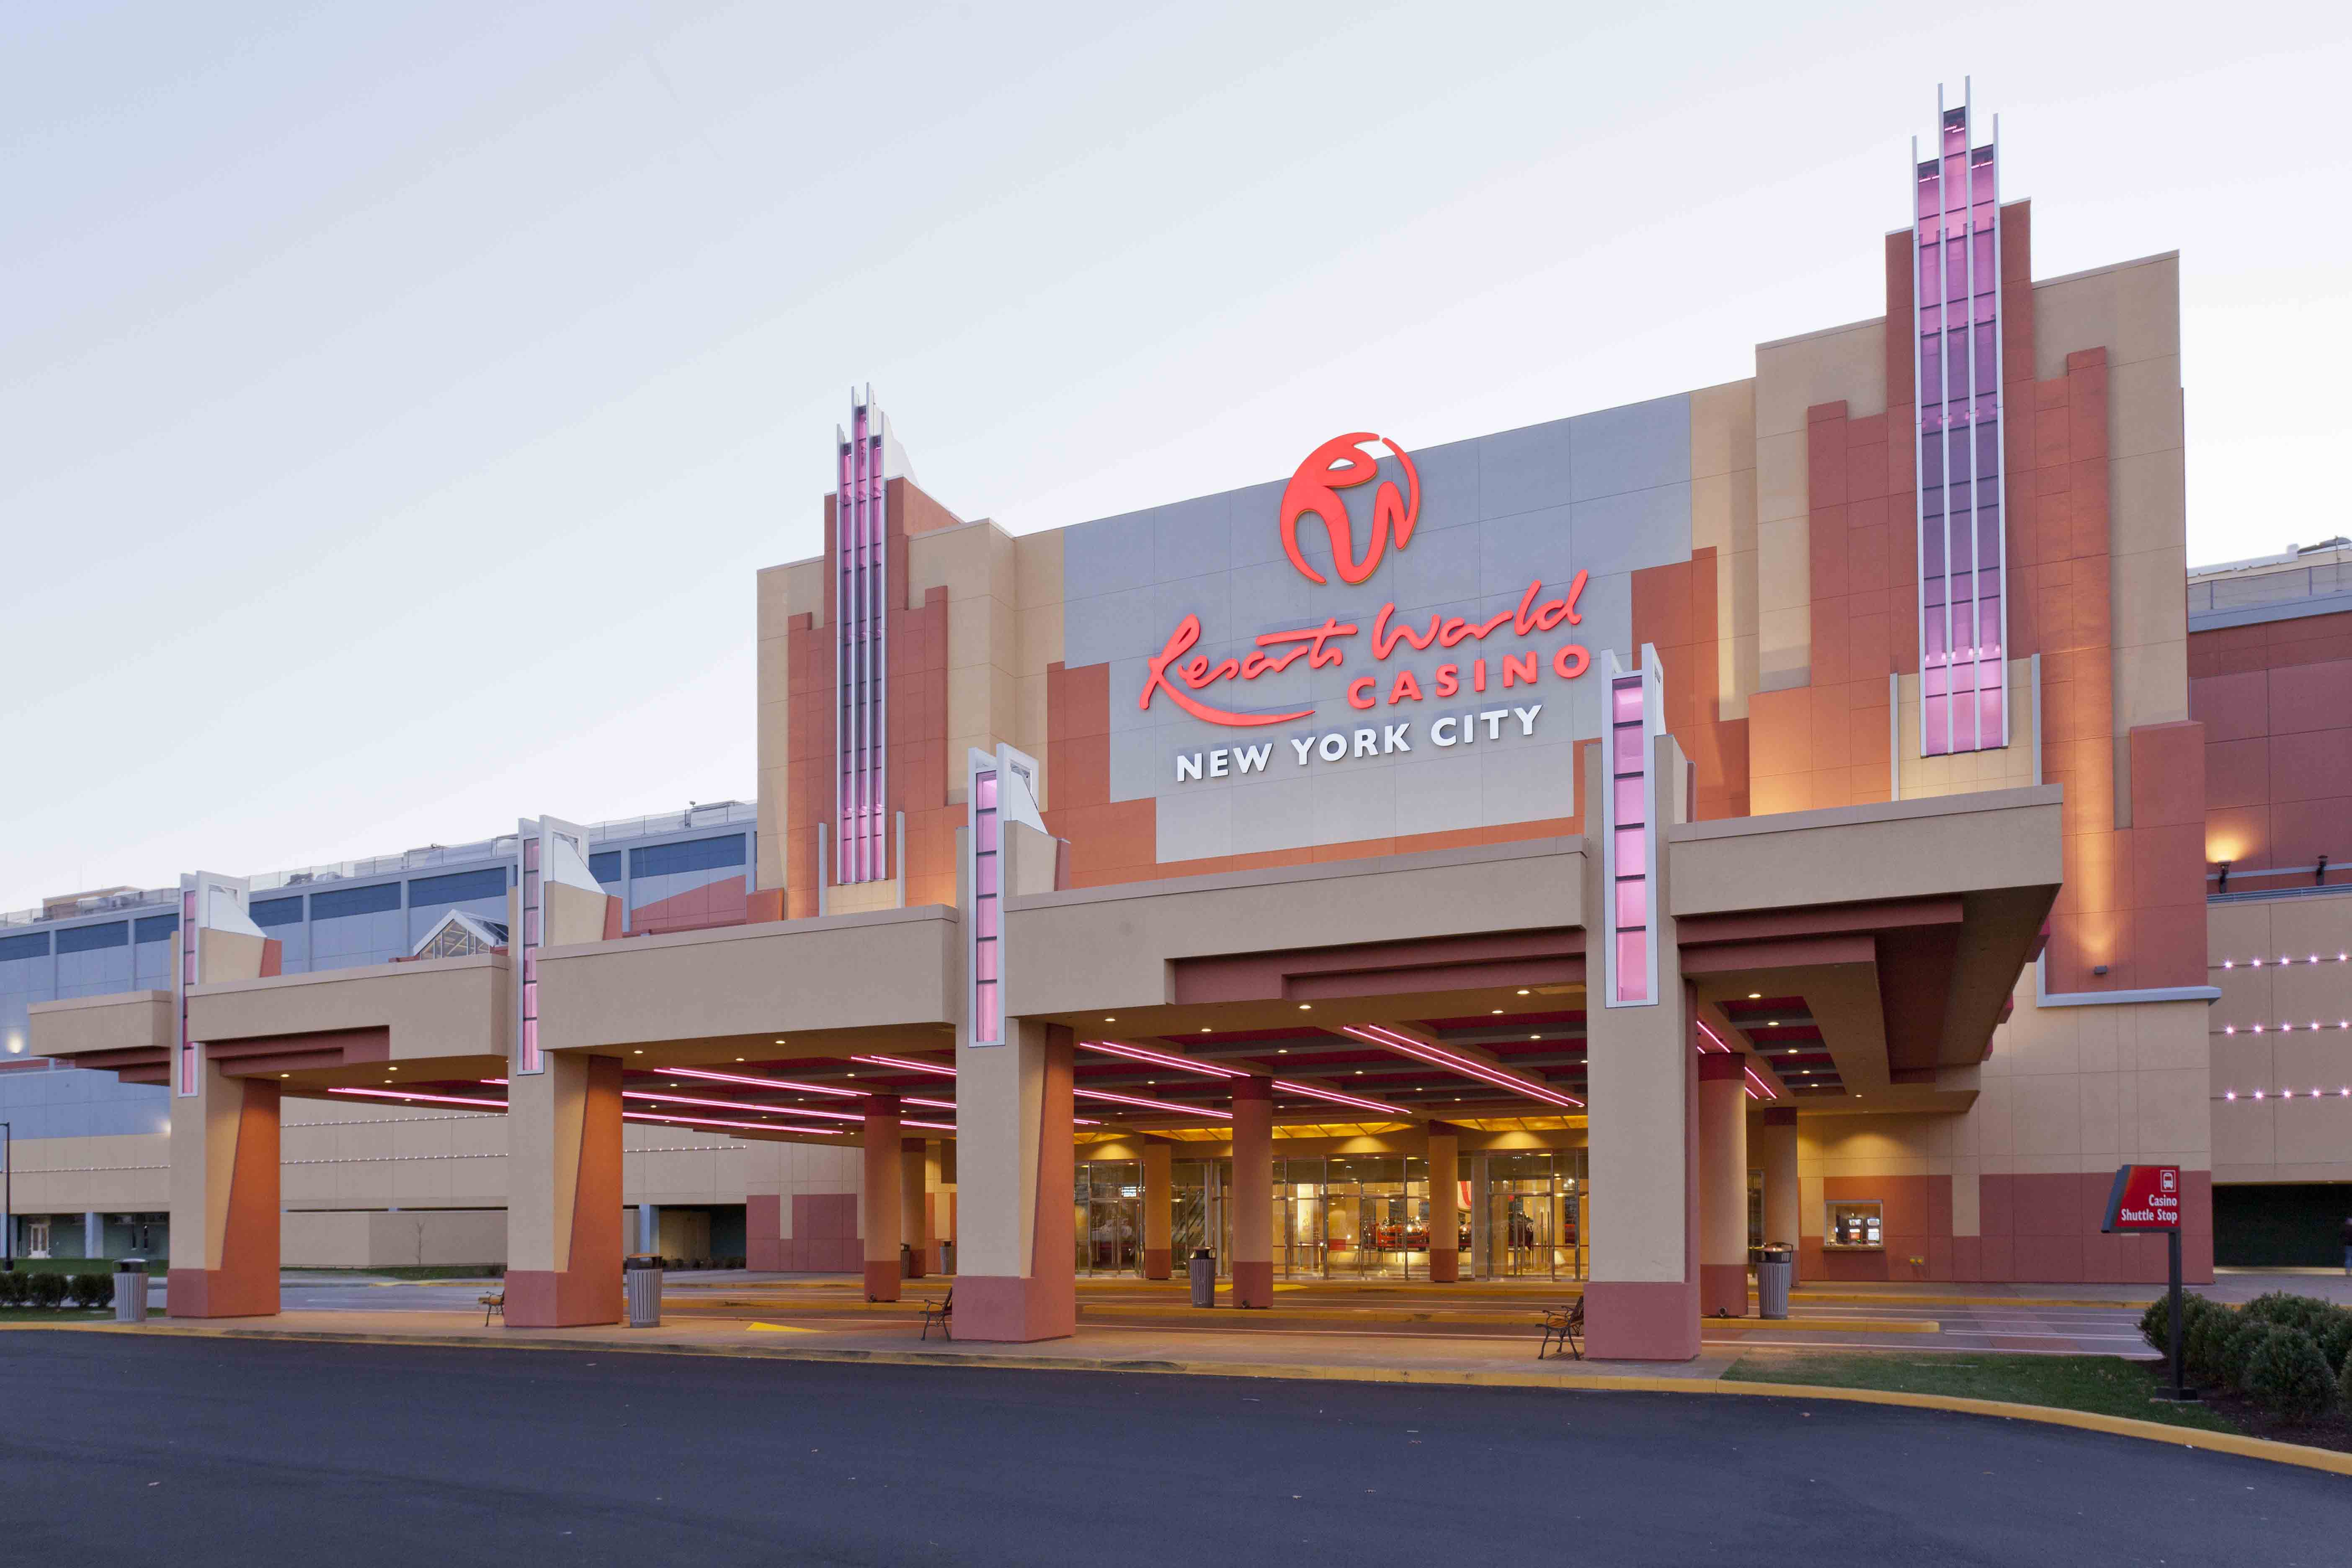 world casino news - 2